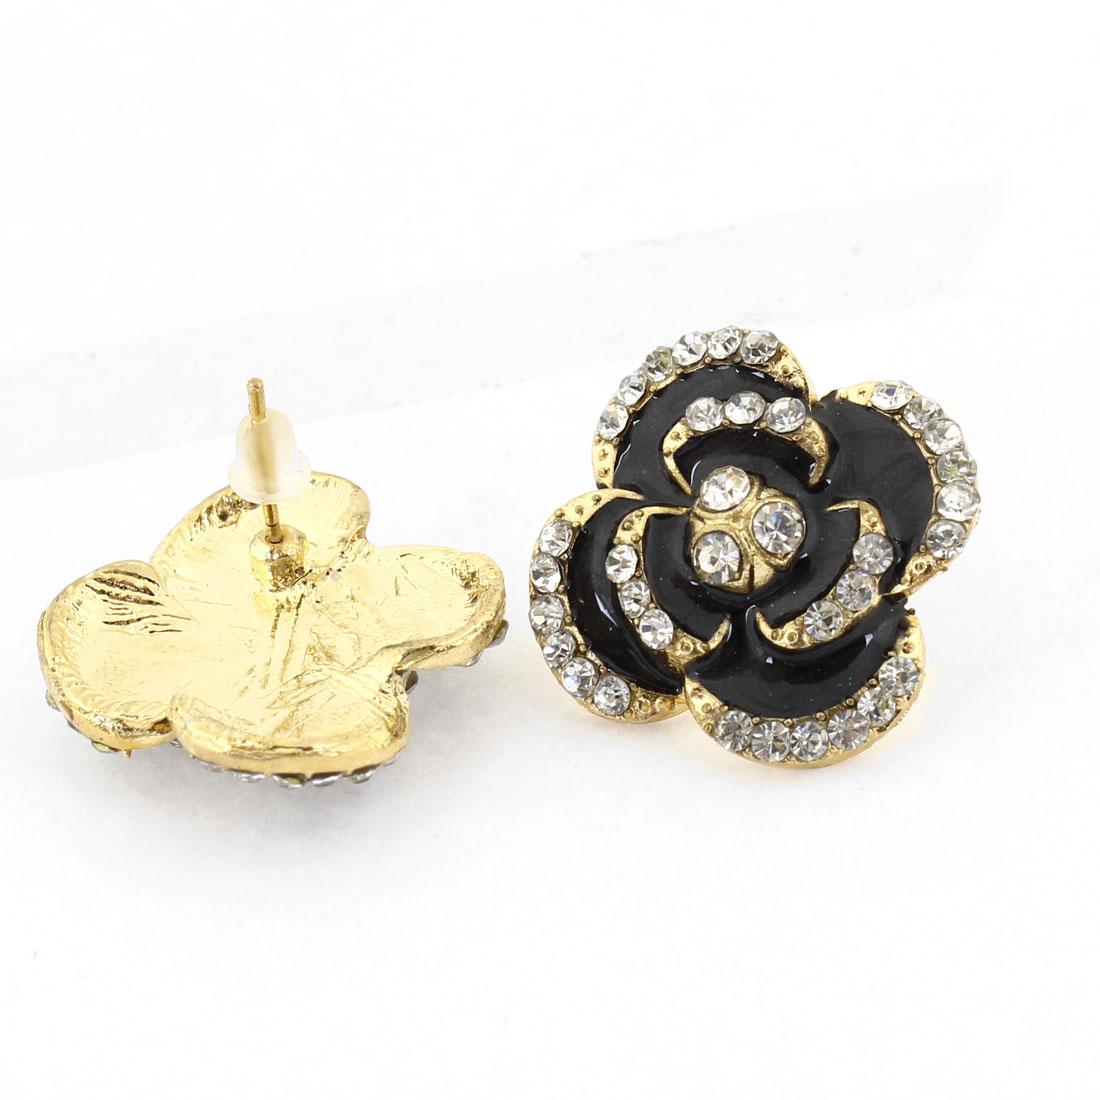 Pair Rhinestones Inlaid Flower Shaped Ornament Stud Earrings Black for Women